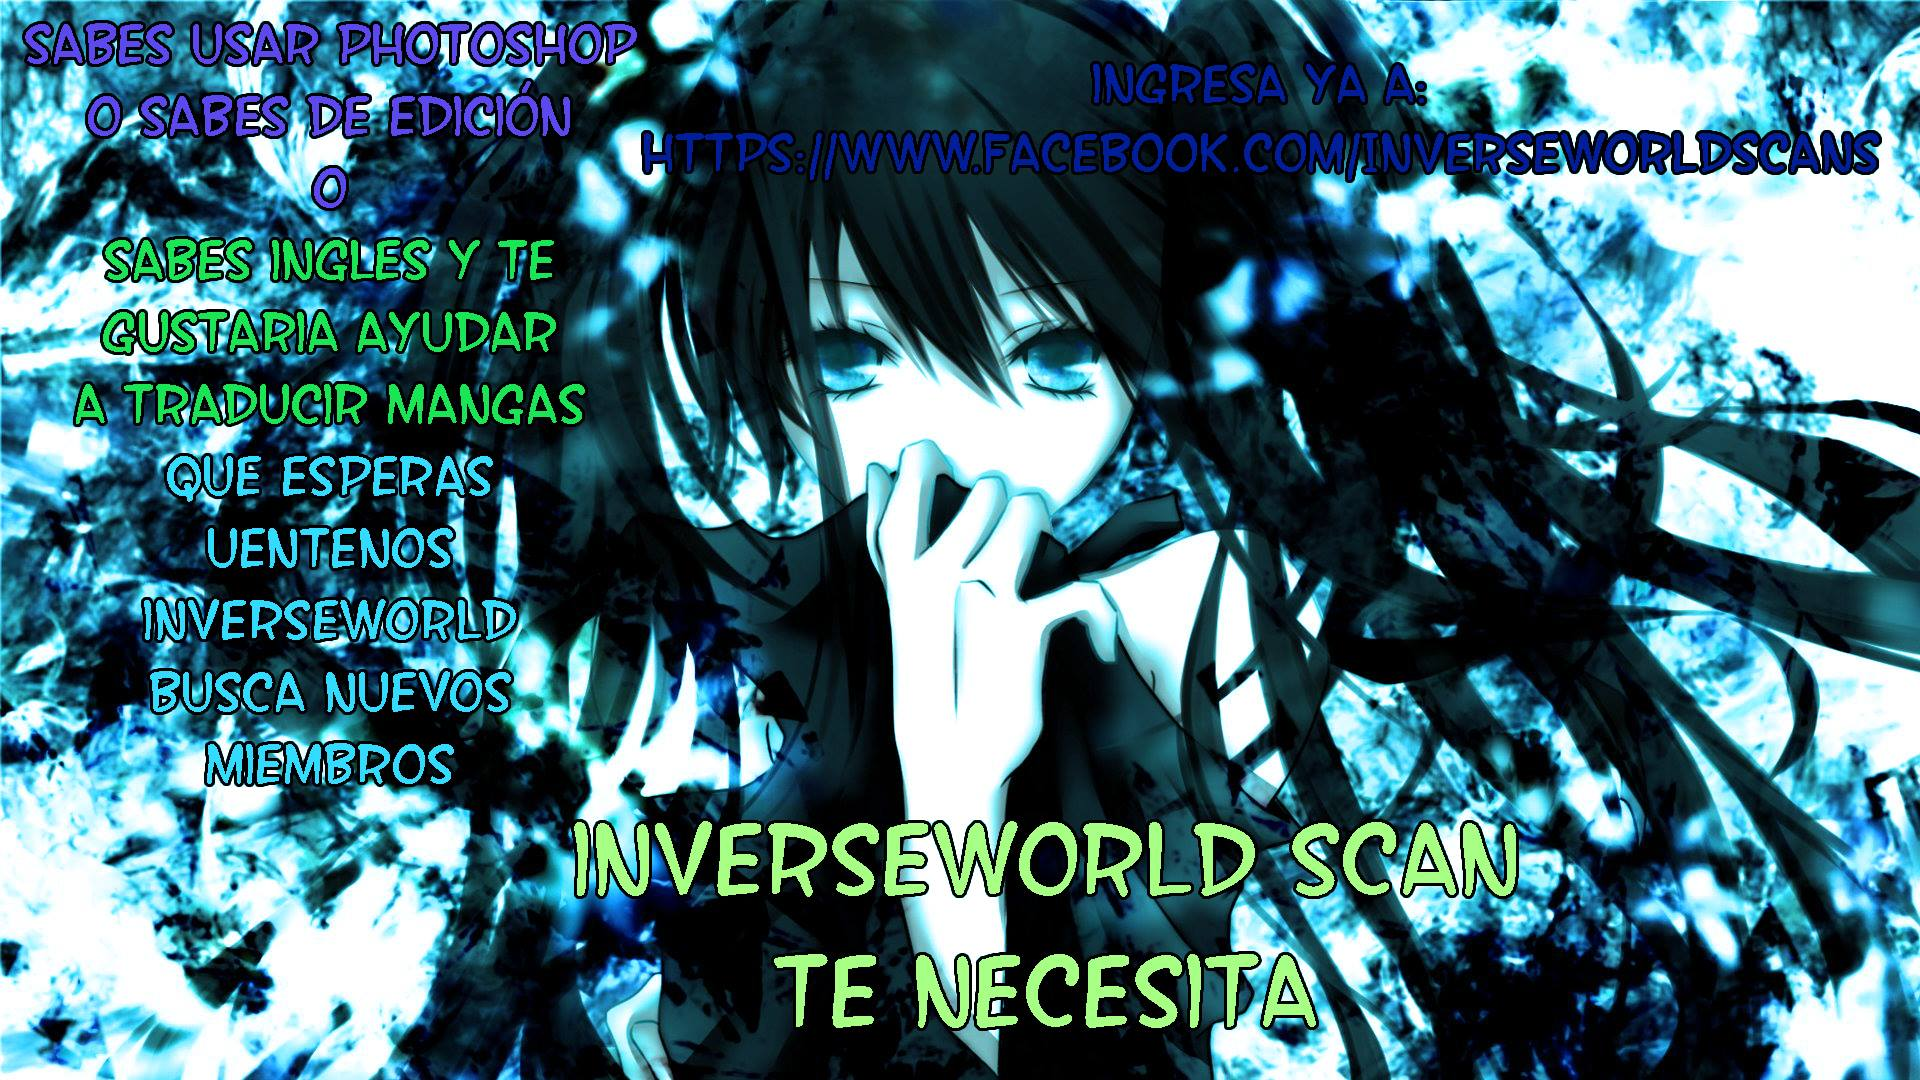 http://c5.ninemanga.com/es_manga/45/16237/390909/d1ce6306d18e2cb9c7453cf07a5471da.jpg Page 2